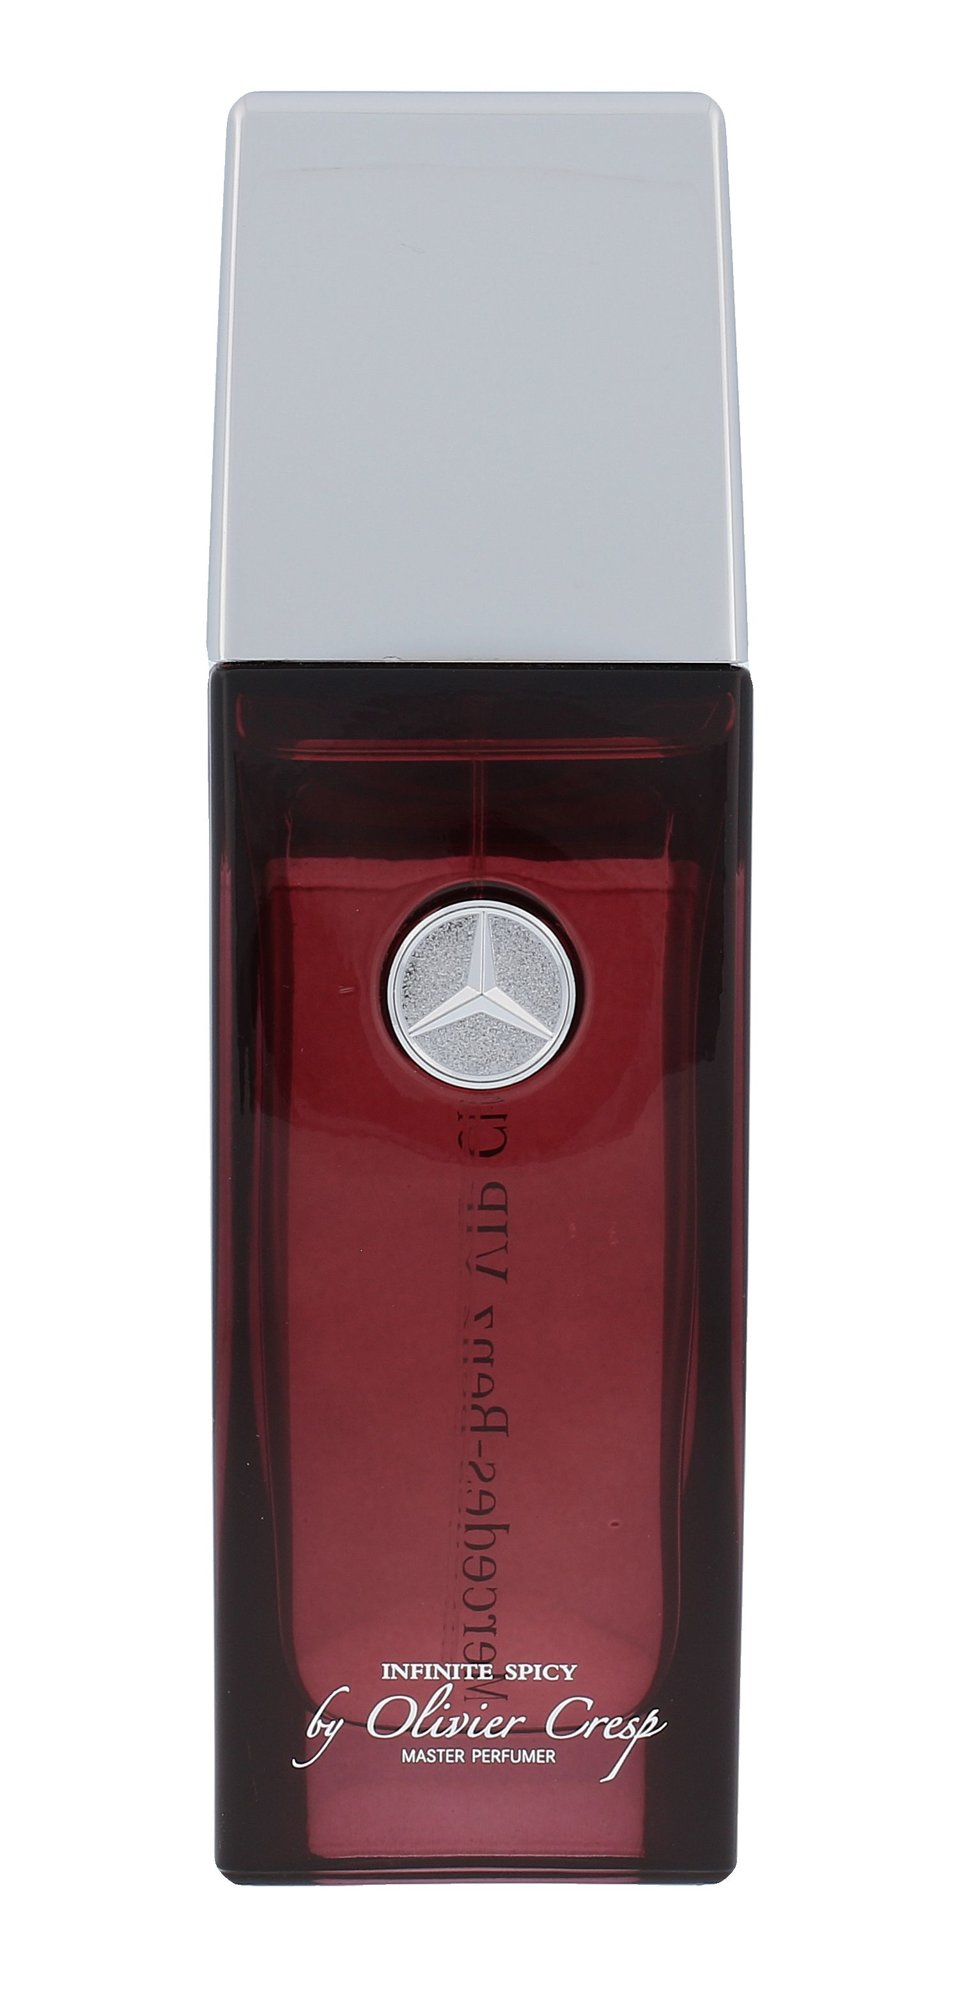 Mercedes-Benz Vip Club Infinite Spicy by Olivier Cresp EDT 100ml